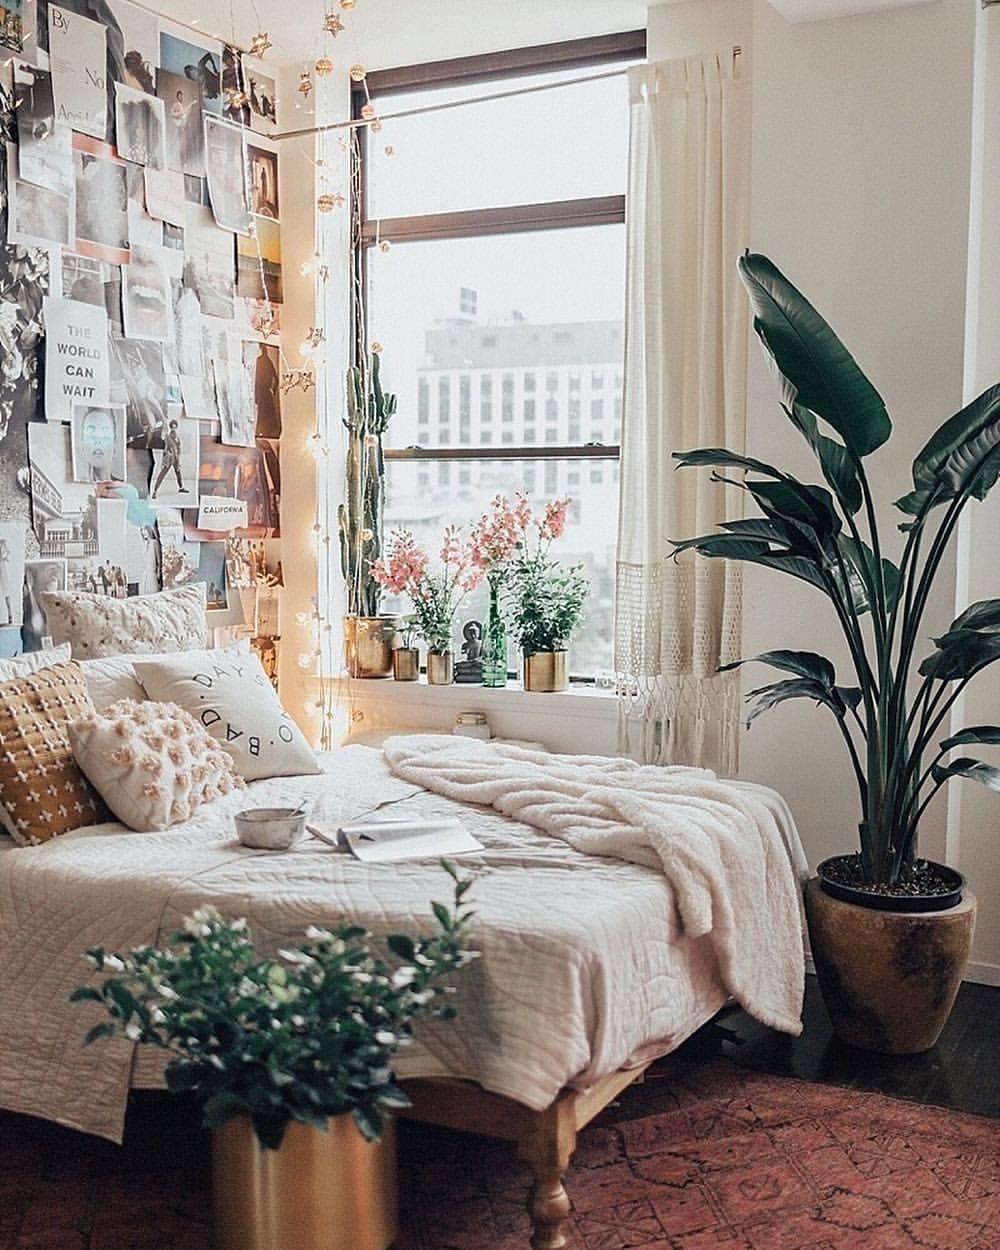 E Commerce Store Apartment Bedroom Decor Room Inspiration